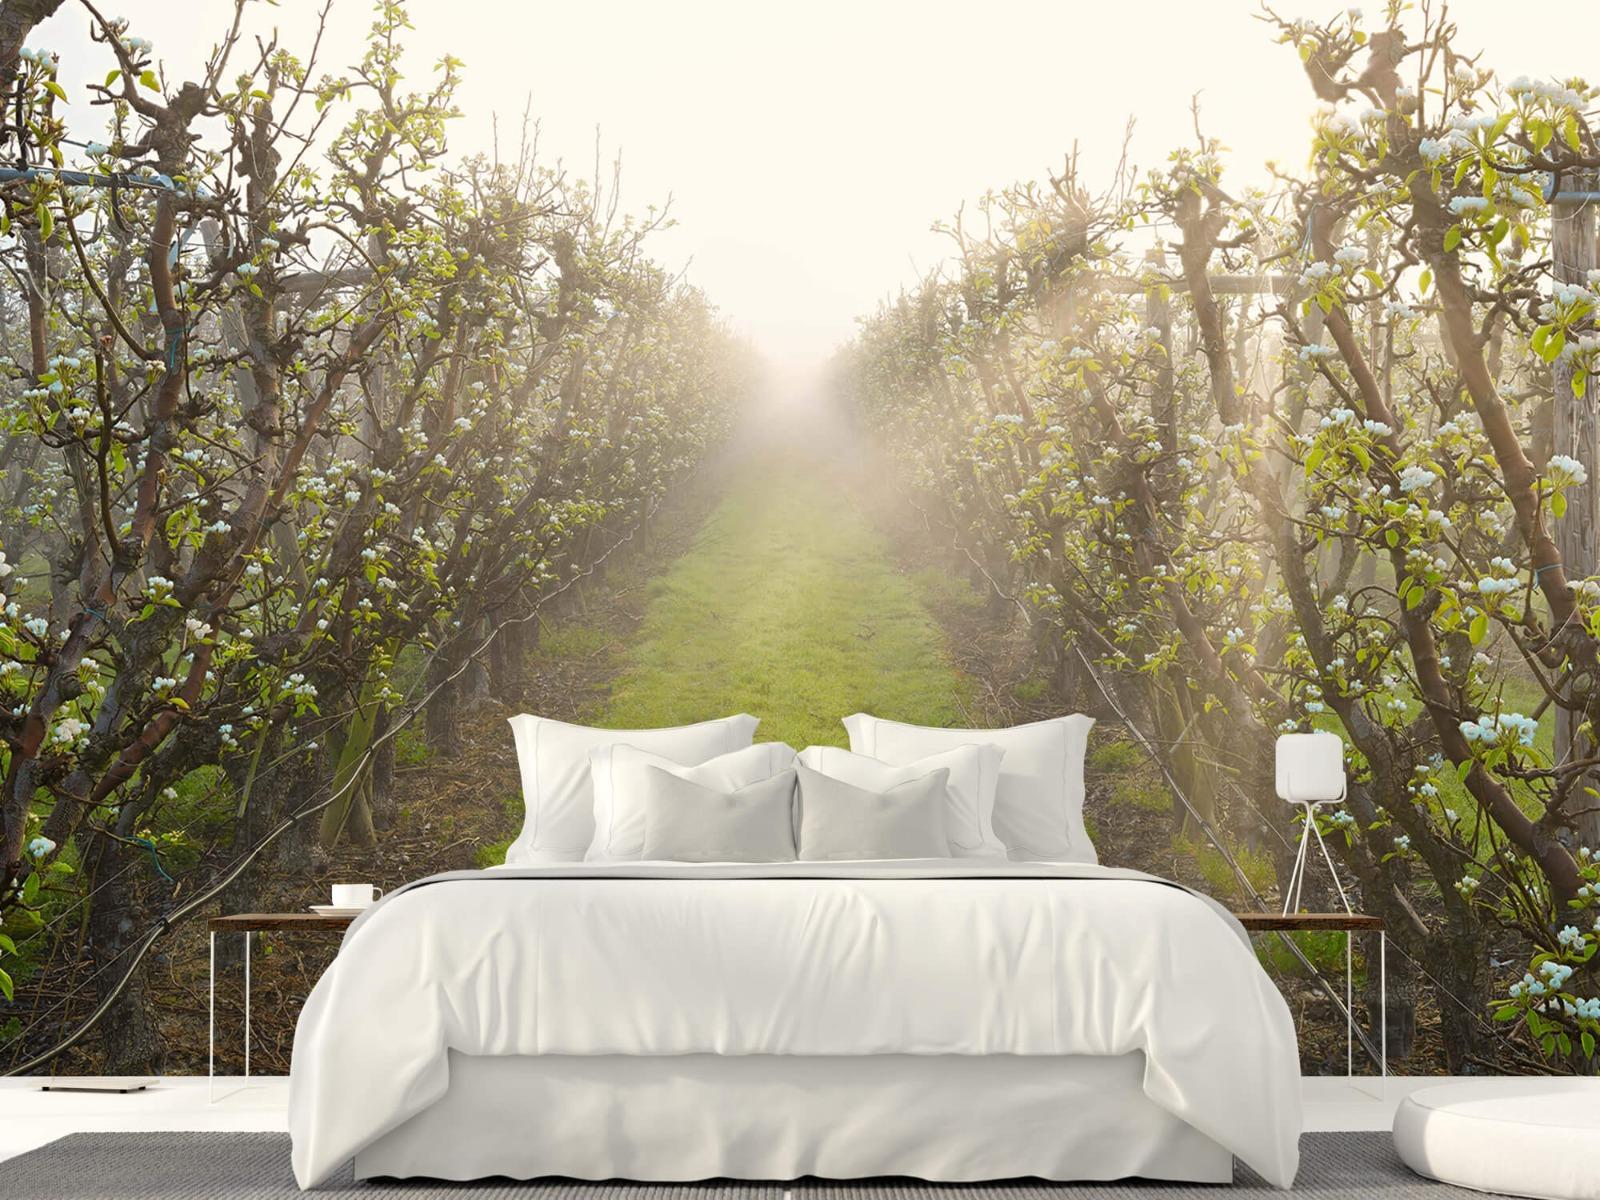 Bomen - Perenbloesem in mist - Slaapkamer 1